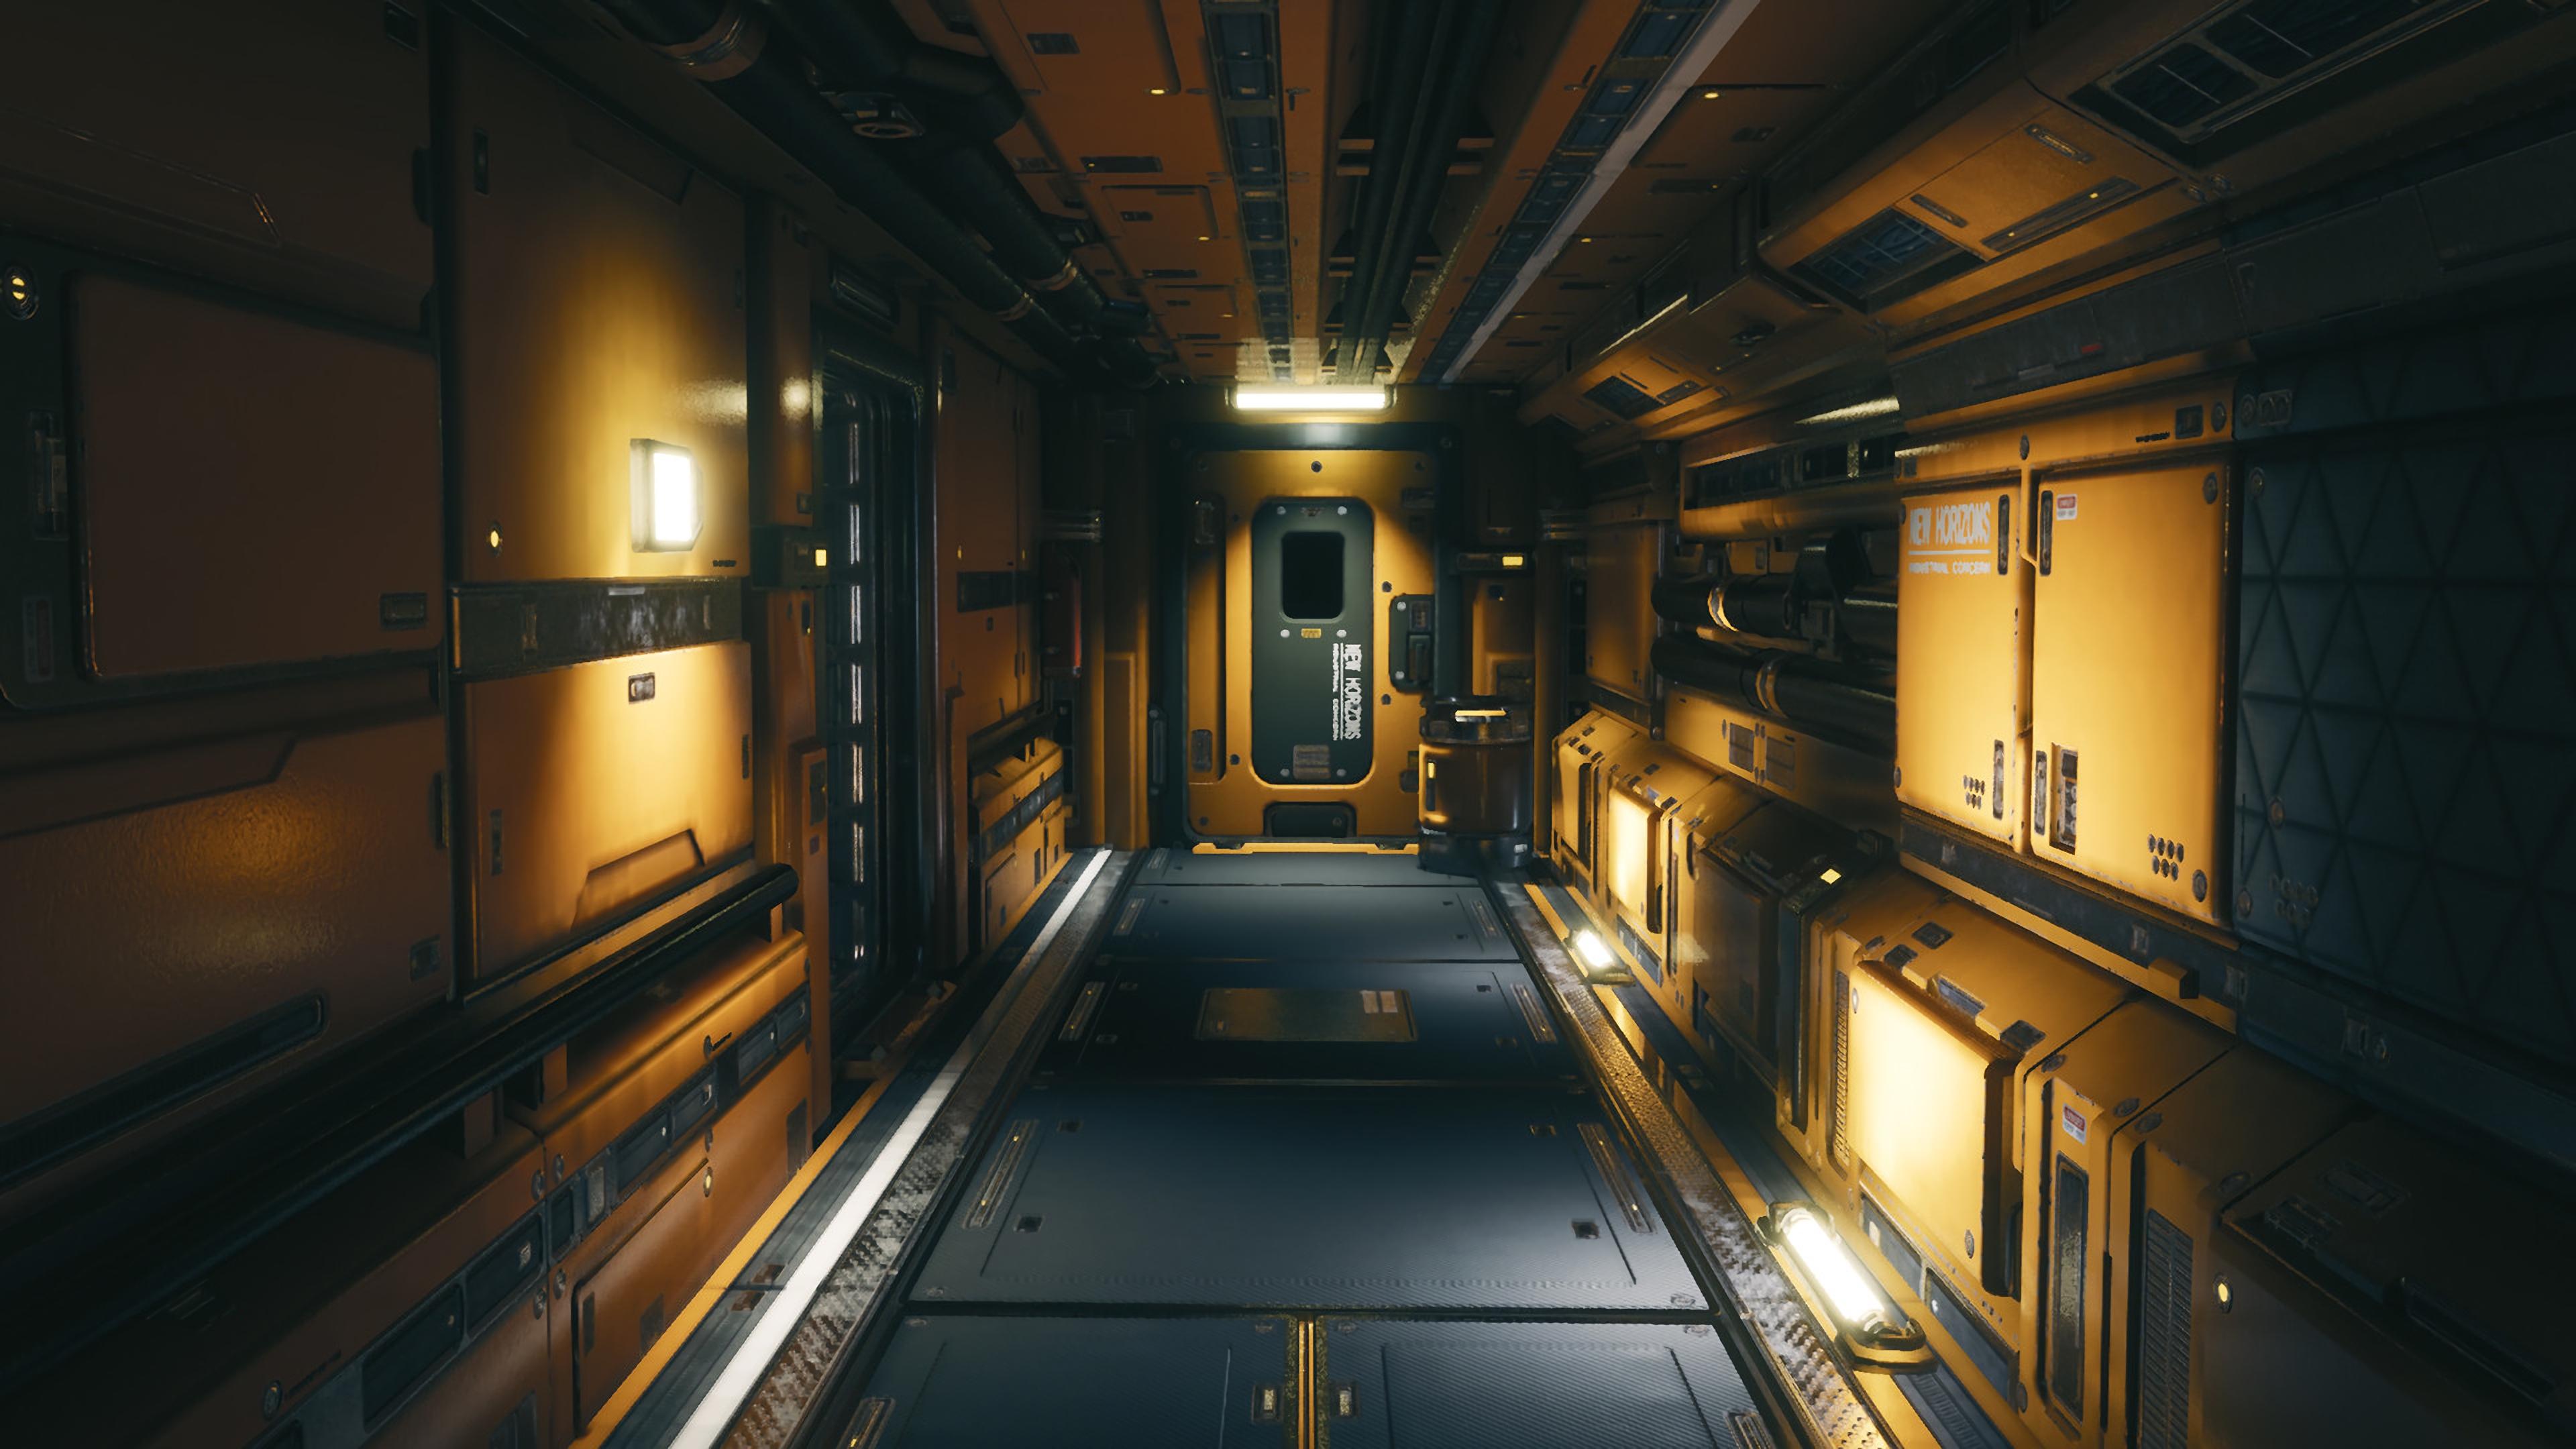 corridor premise modular environment sci fi 4k 1541971225 - corridor, premise, modular environment, sci-fi 4k - premise, modular environment, corridor